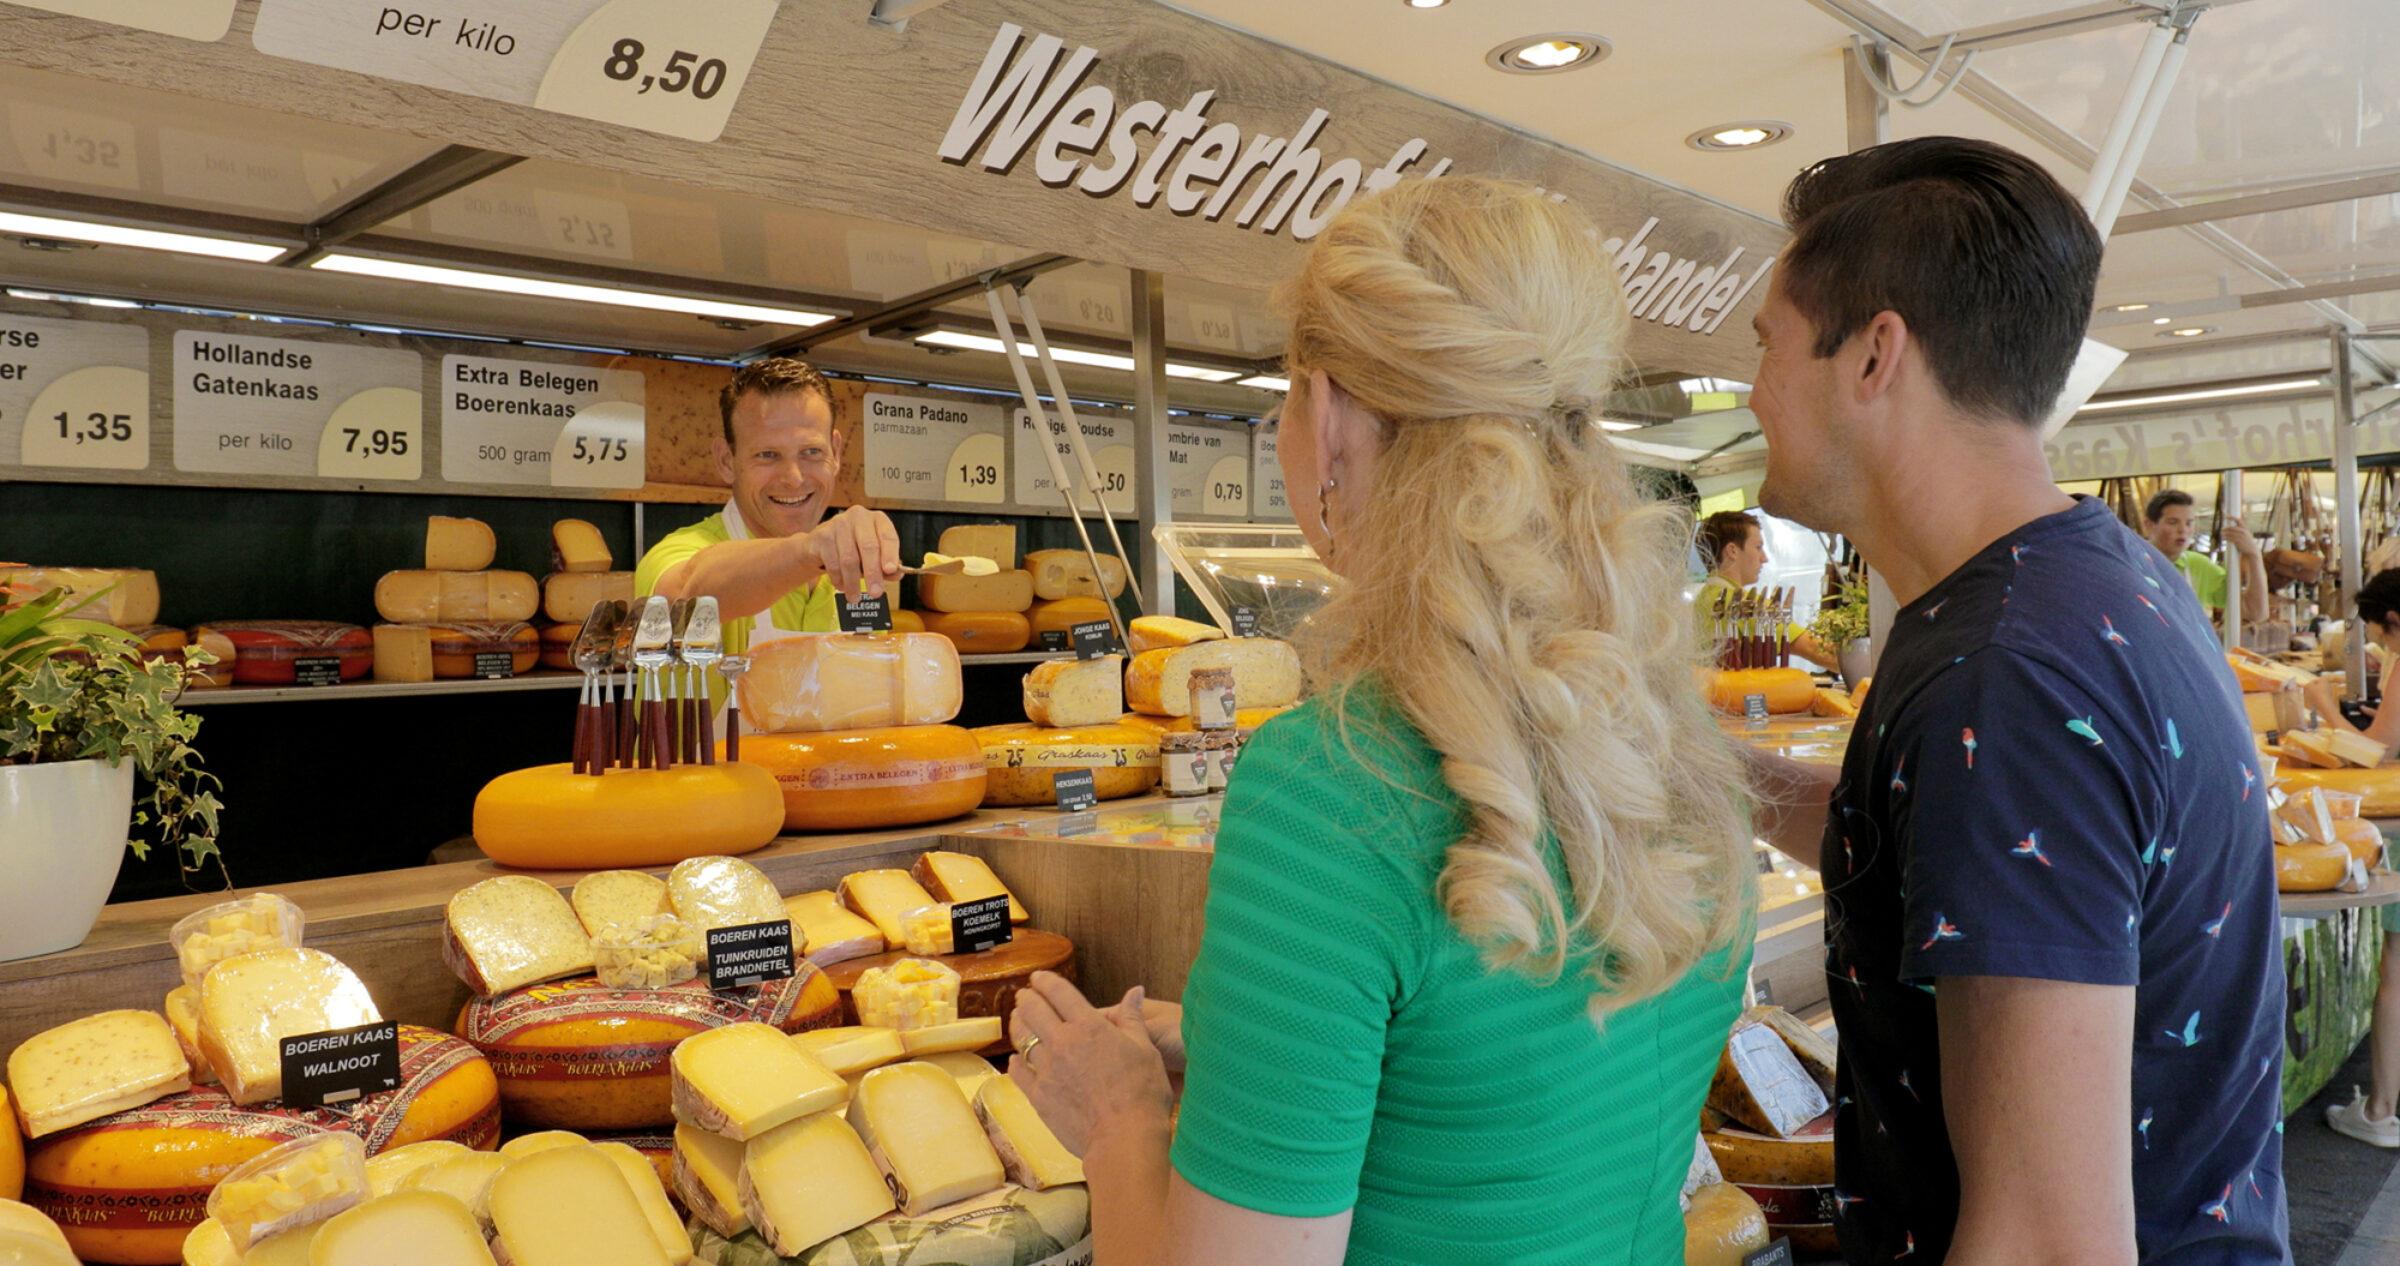 Markt in Enschede